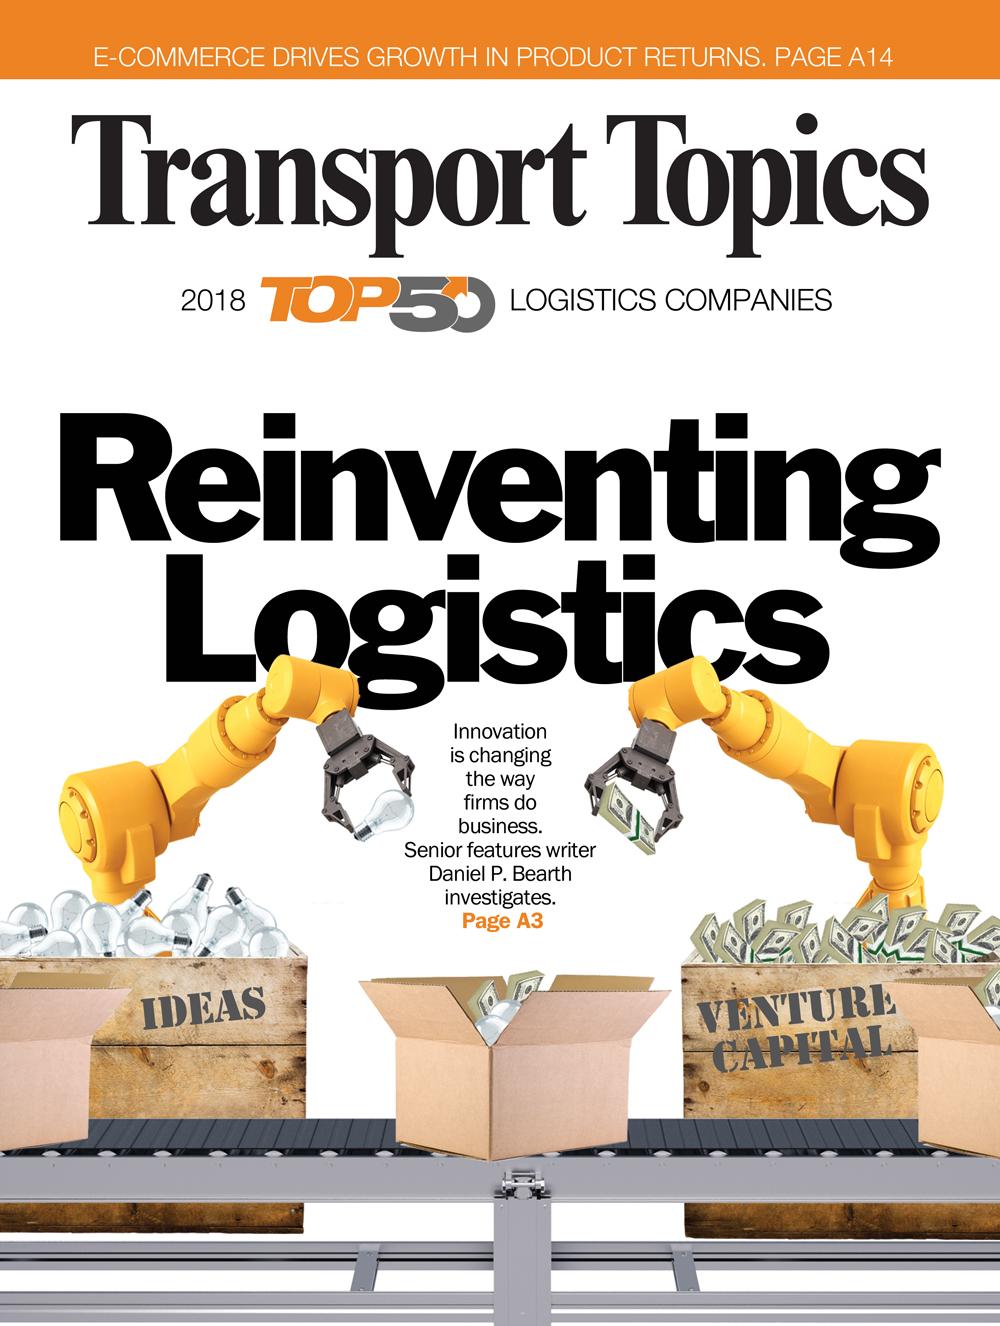 About Us: Transport Topics' Top 50 Logistics Companies